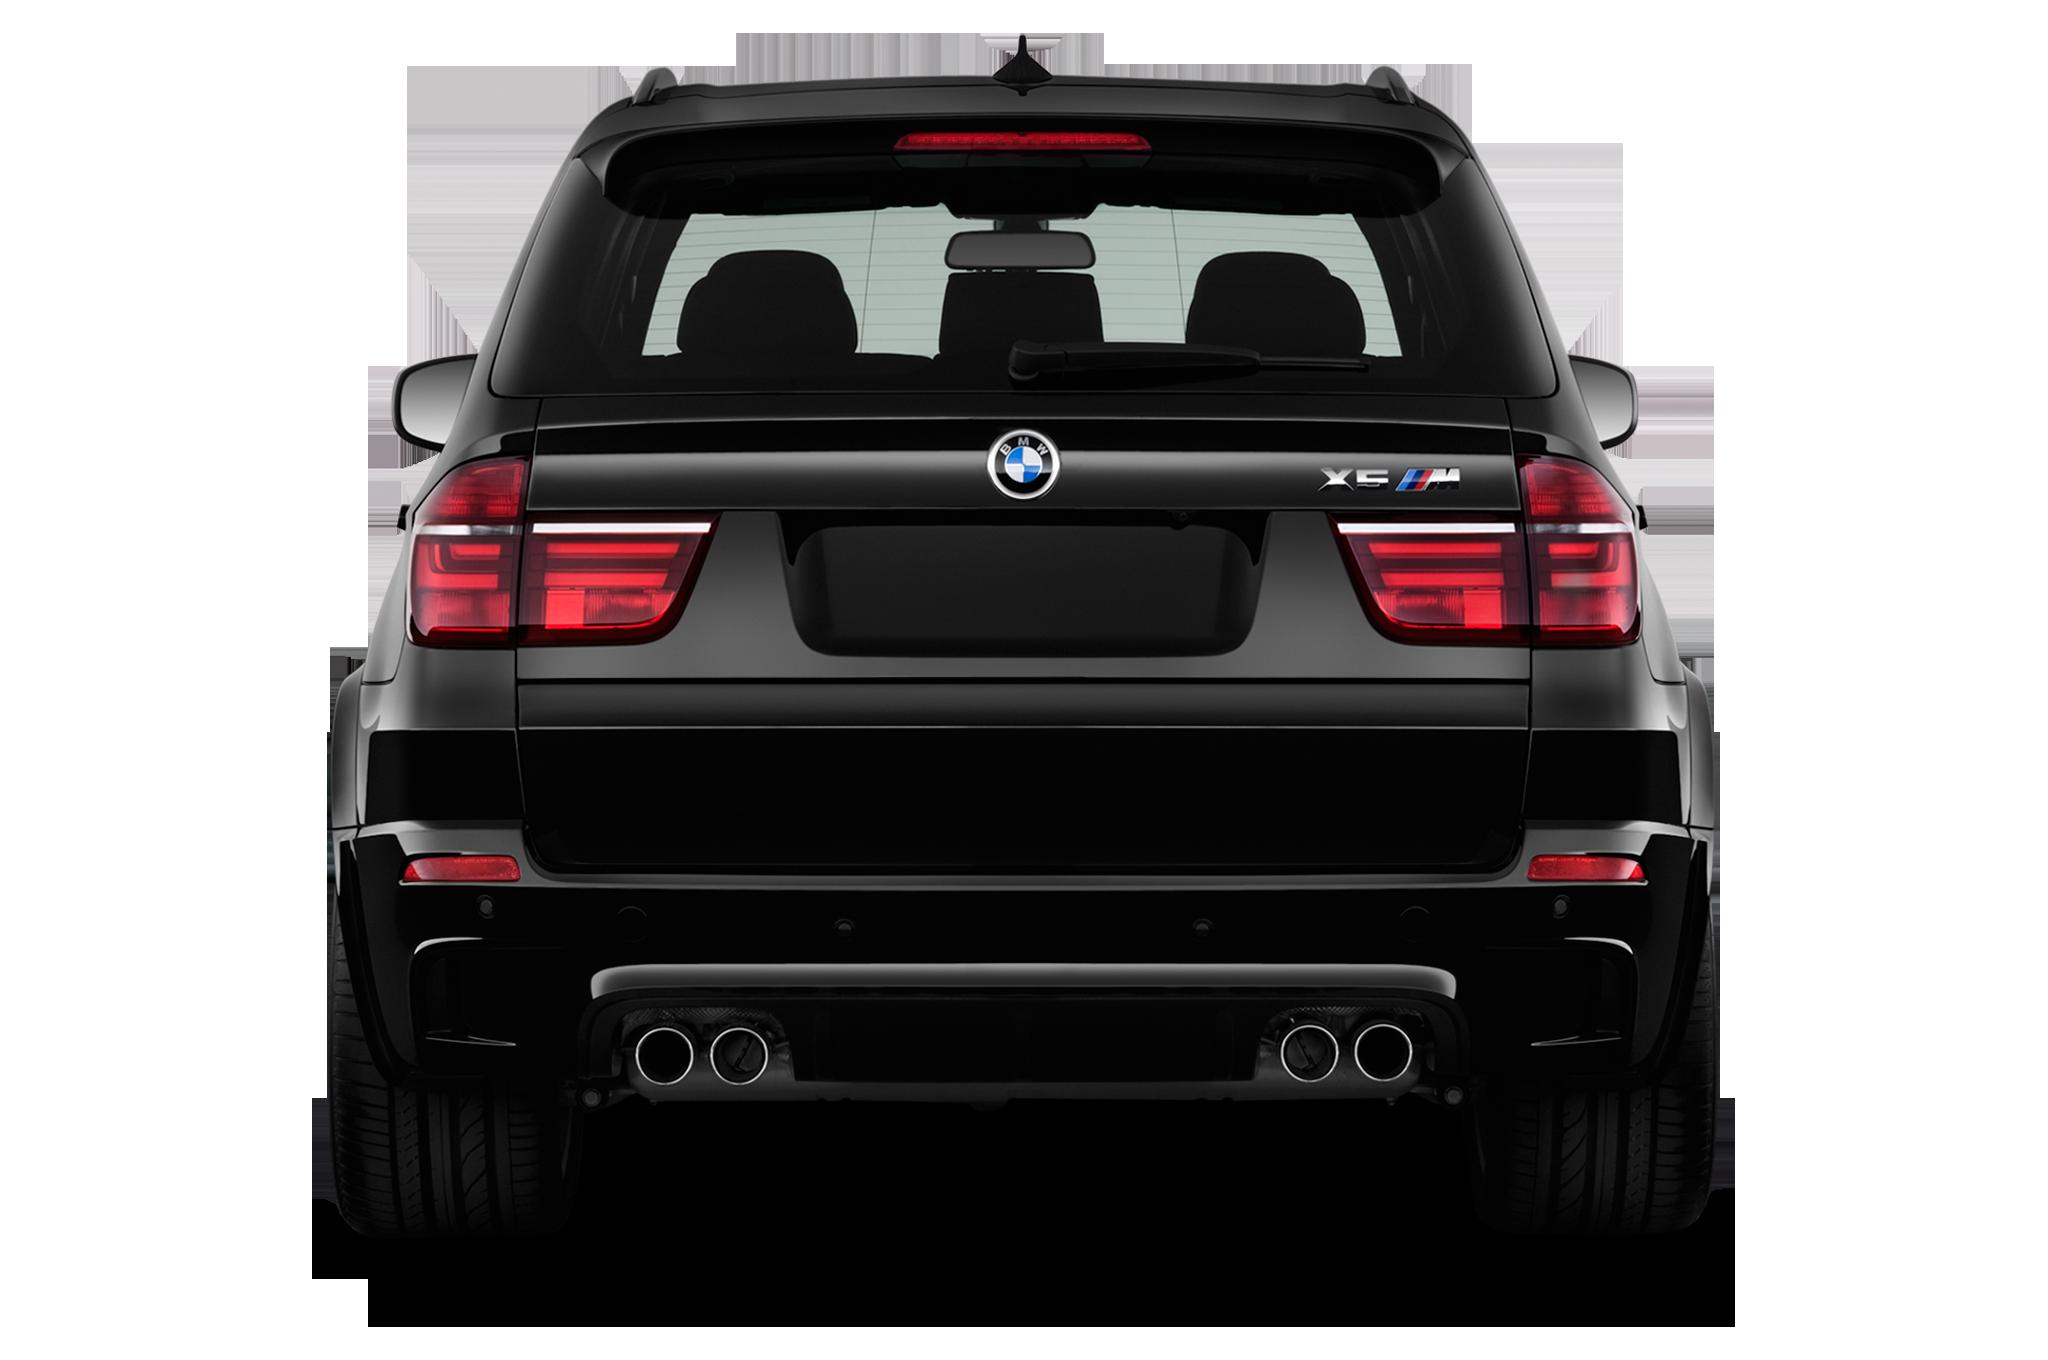 BMW X6 I E71 Restyling 2012